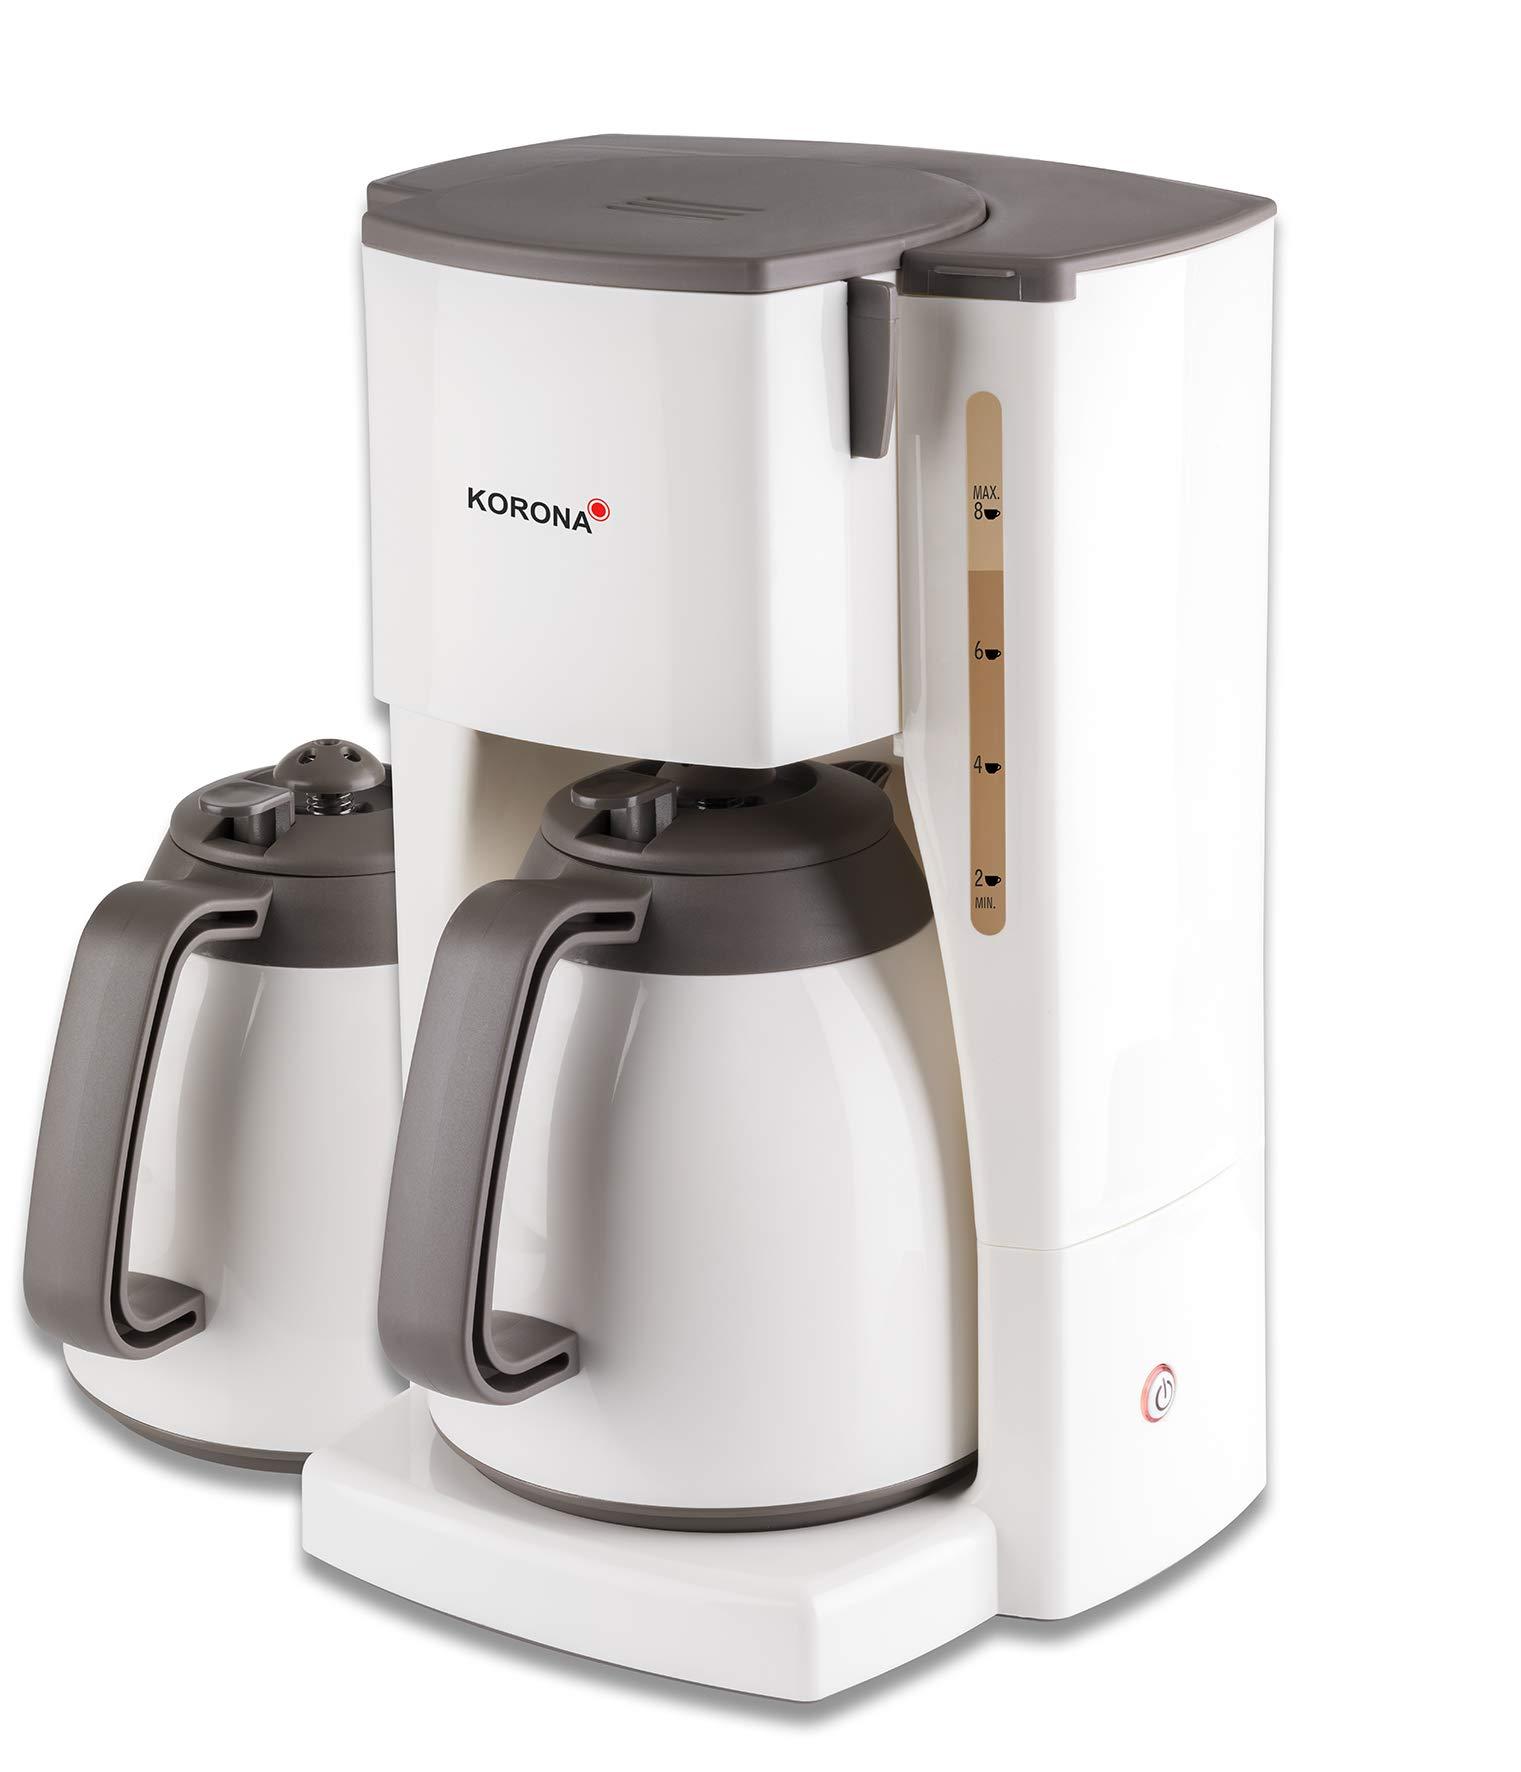 Korona - Cafetera con jarra térmica Thermokaffeeauotmat 2 Kannen crema-marrón: Amazon.es: Hogar